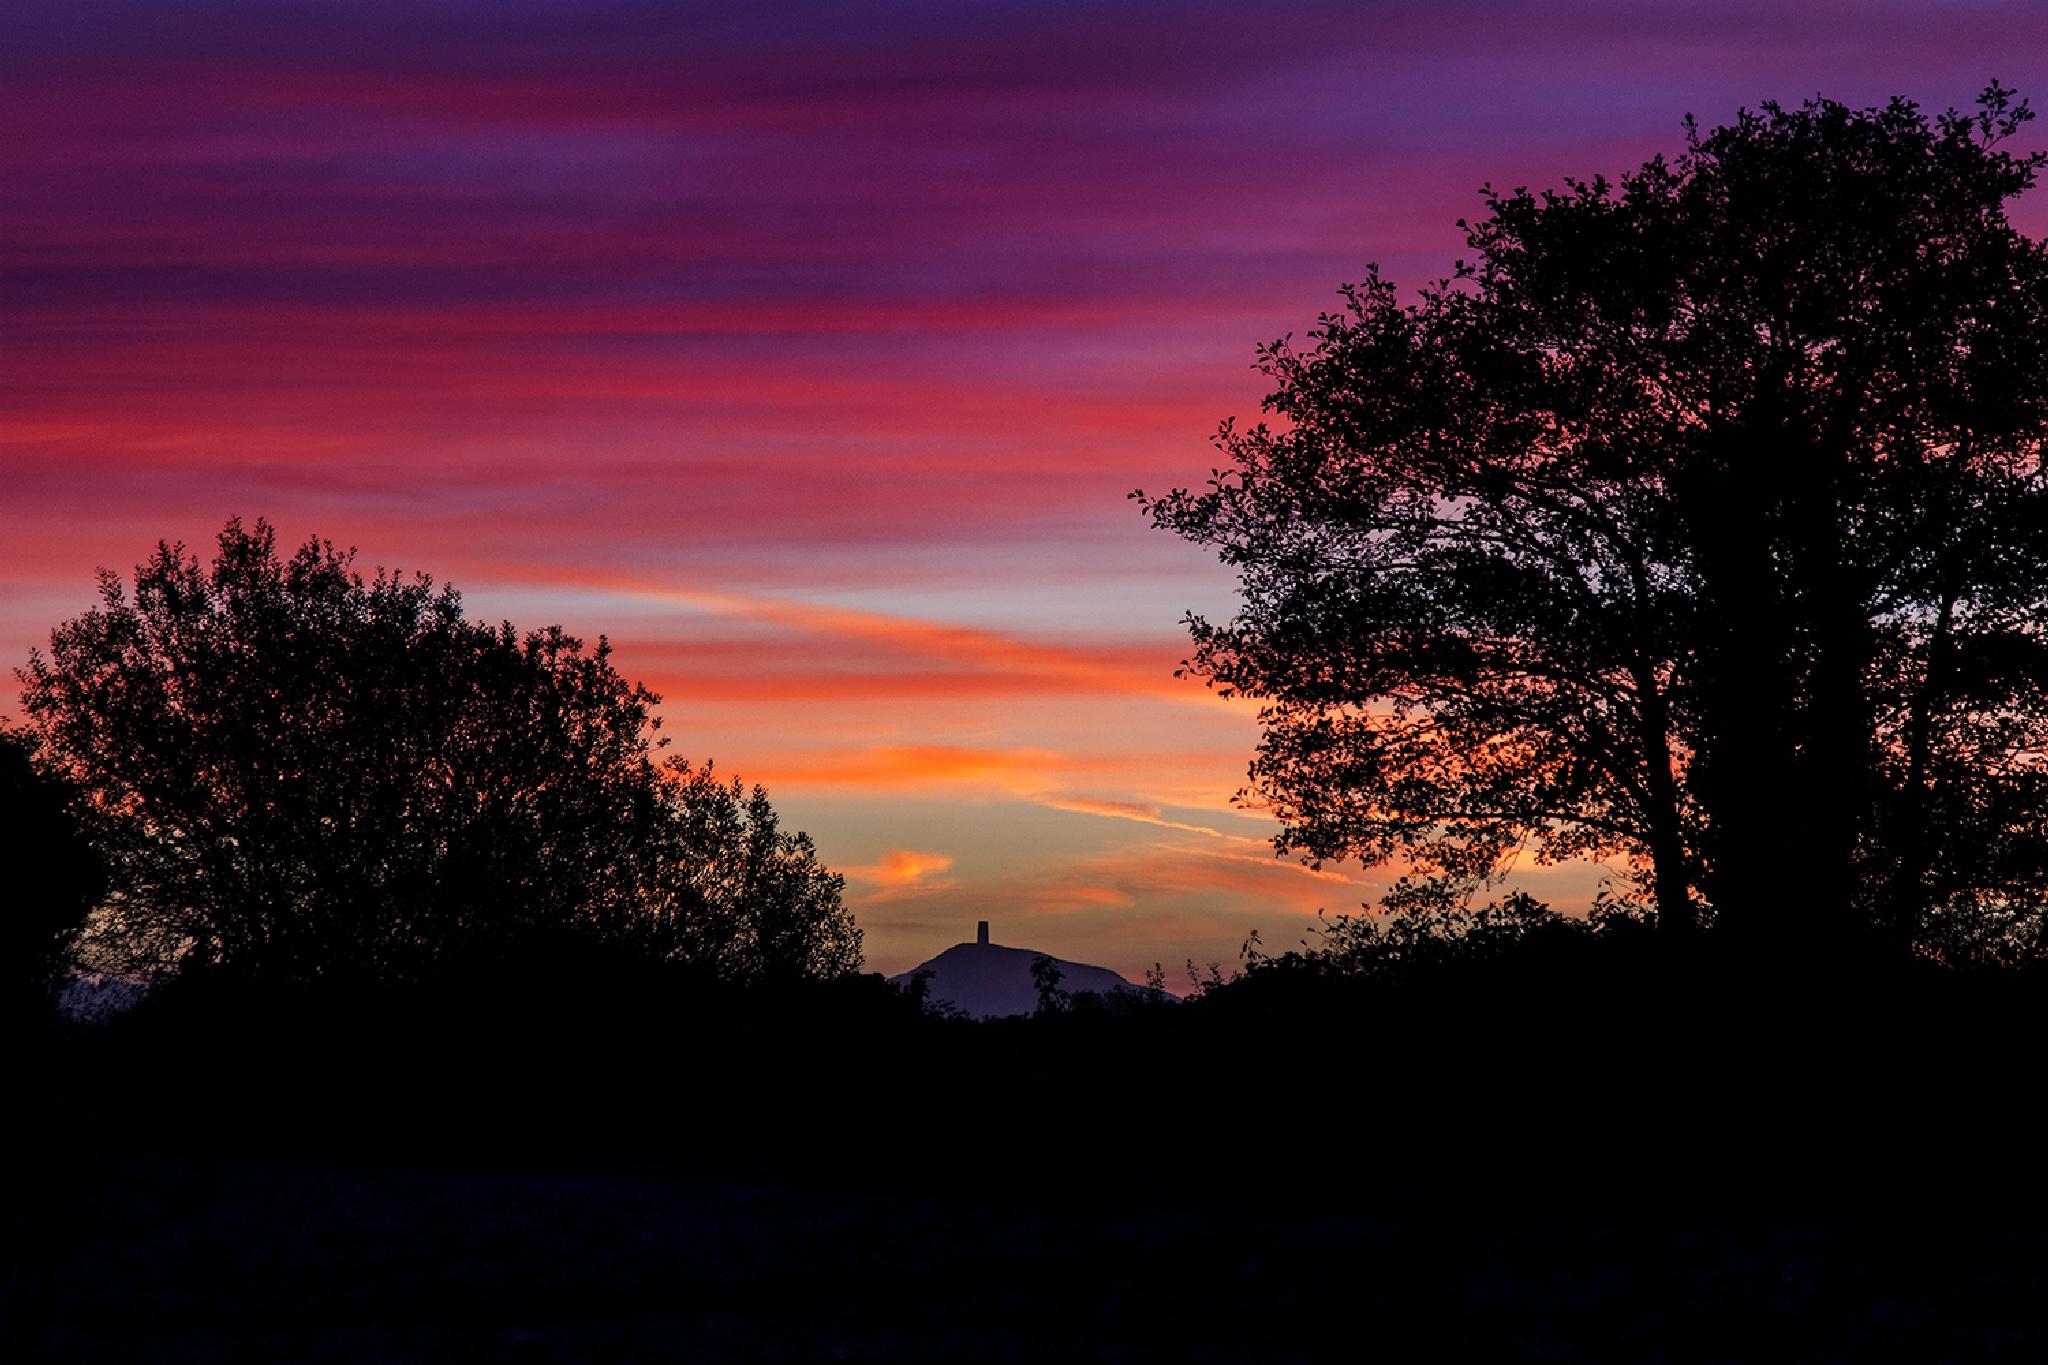 Avalon Sunrise by metallipaul